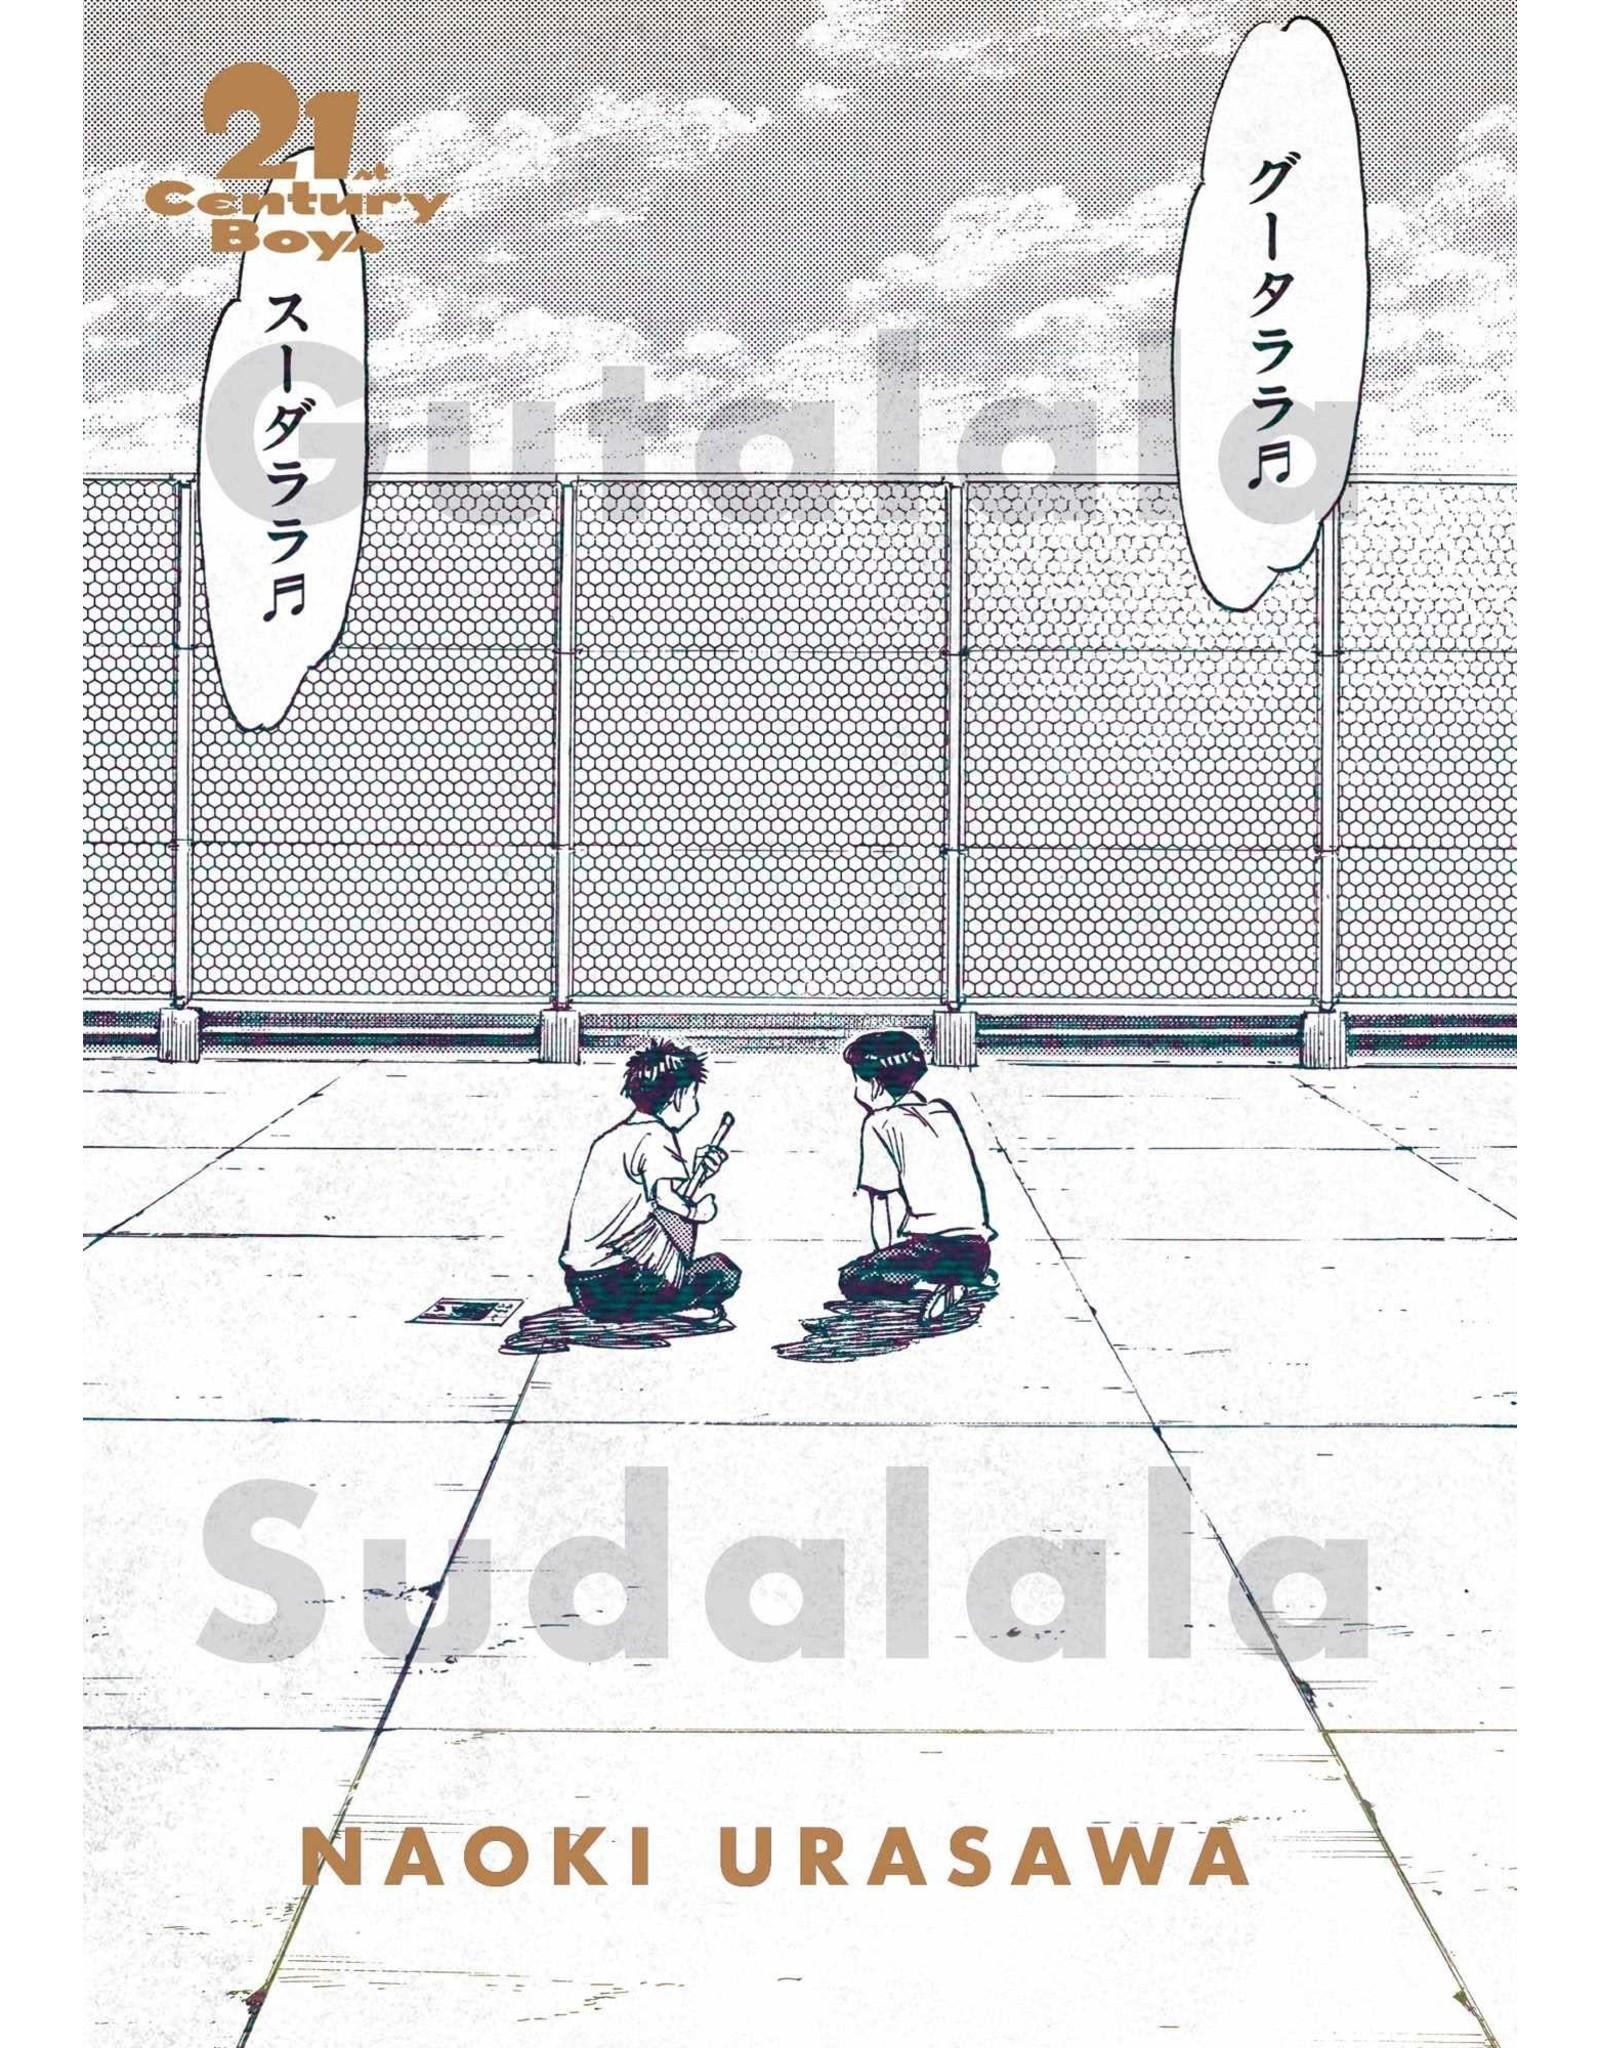 21st Century Boys: The Perfect Edition (English) - Manga